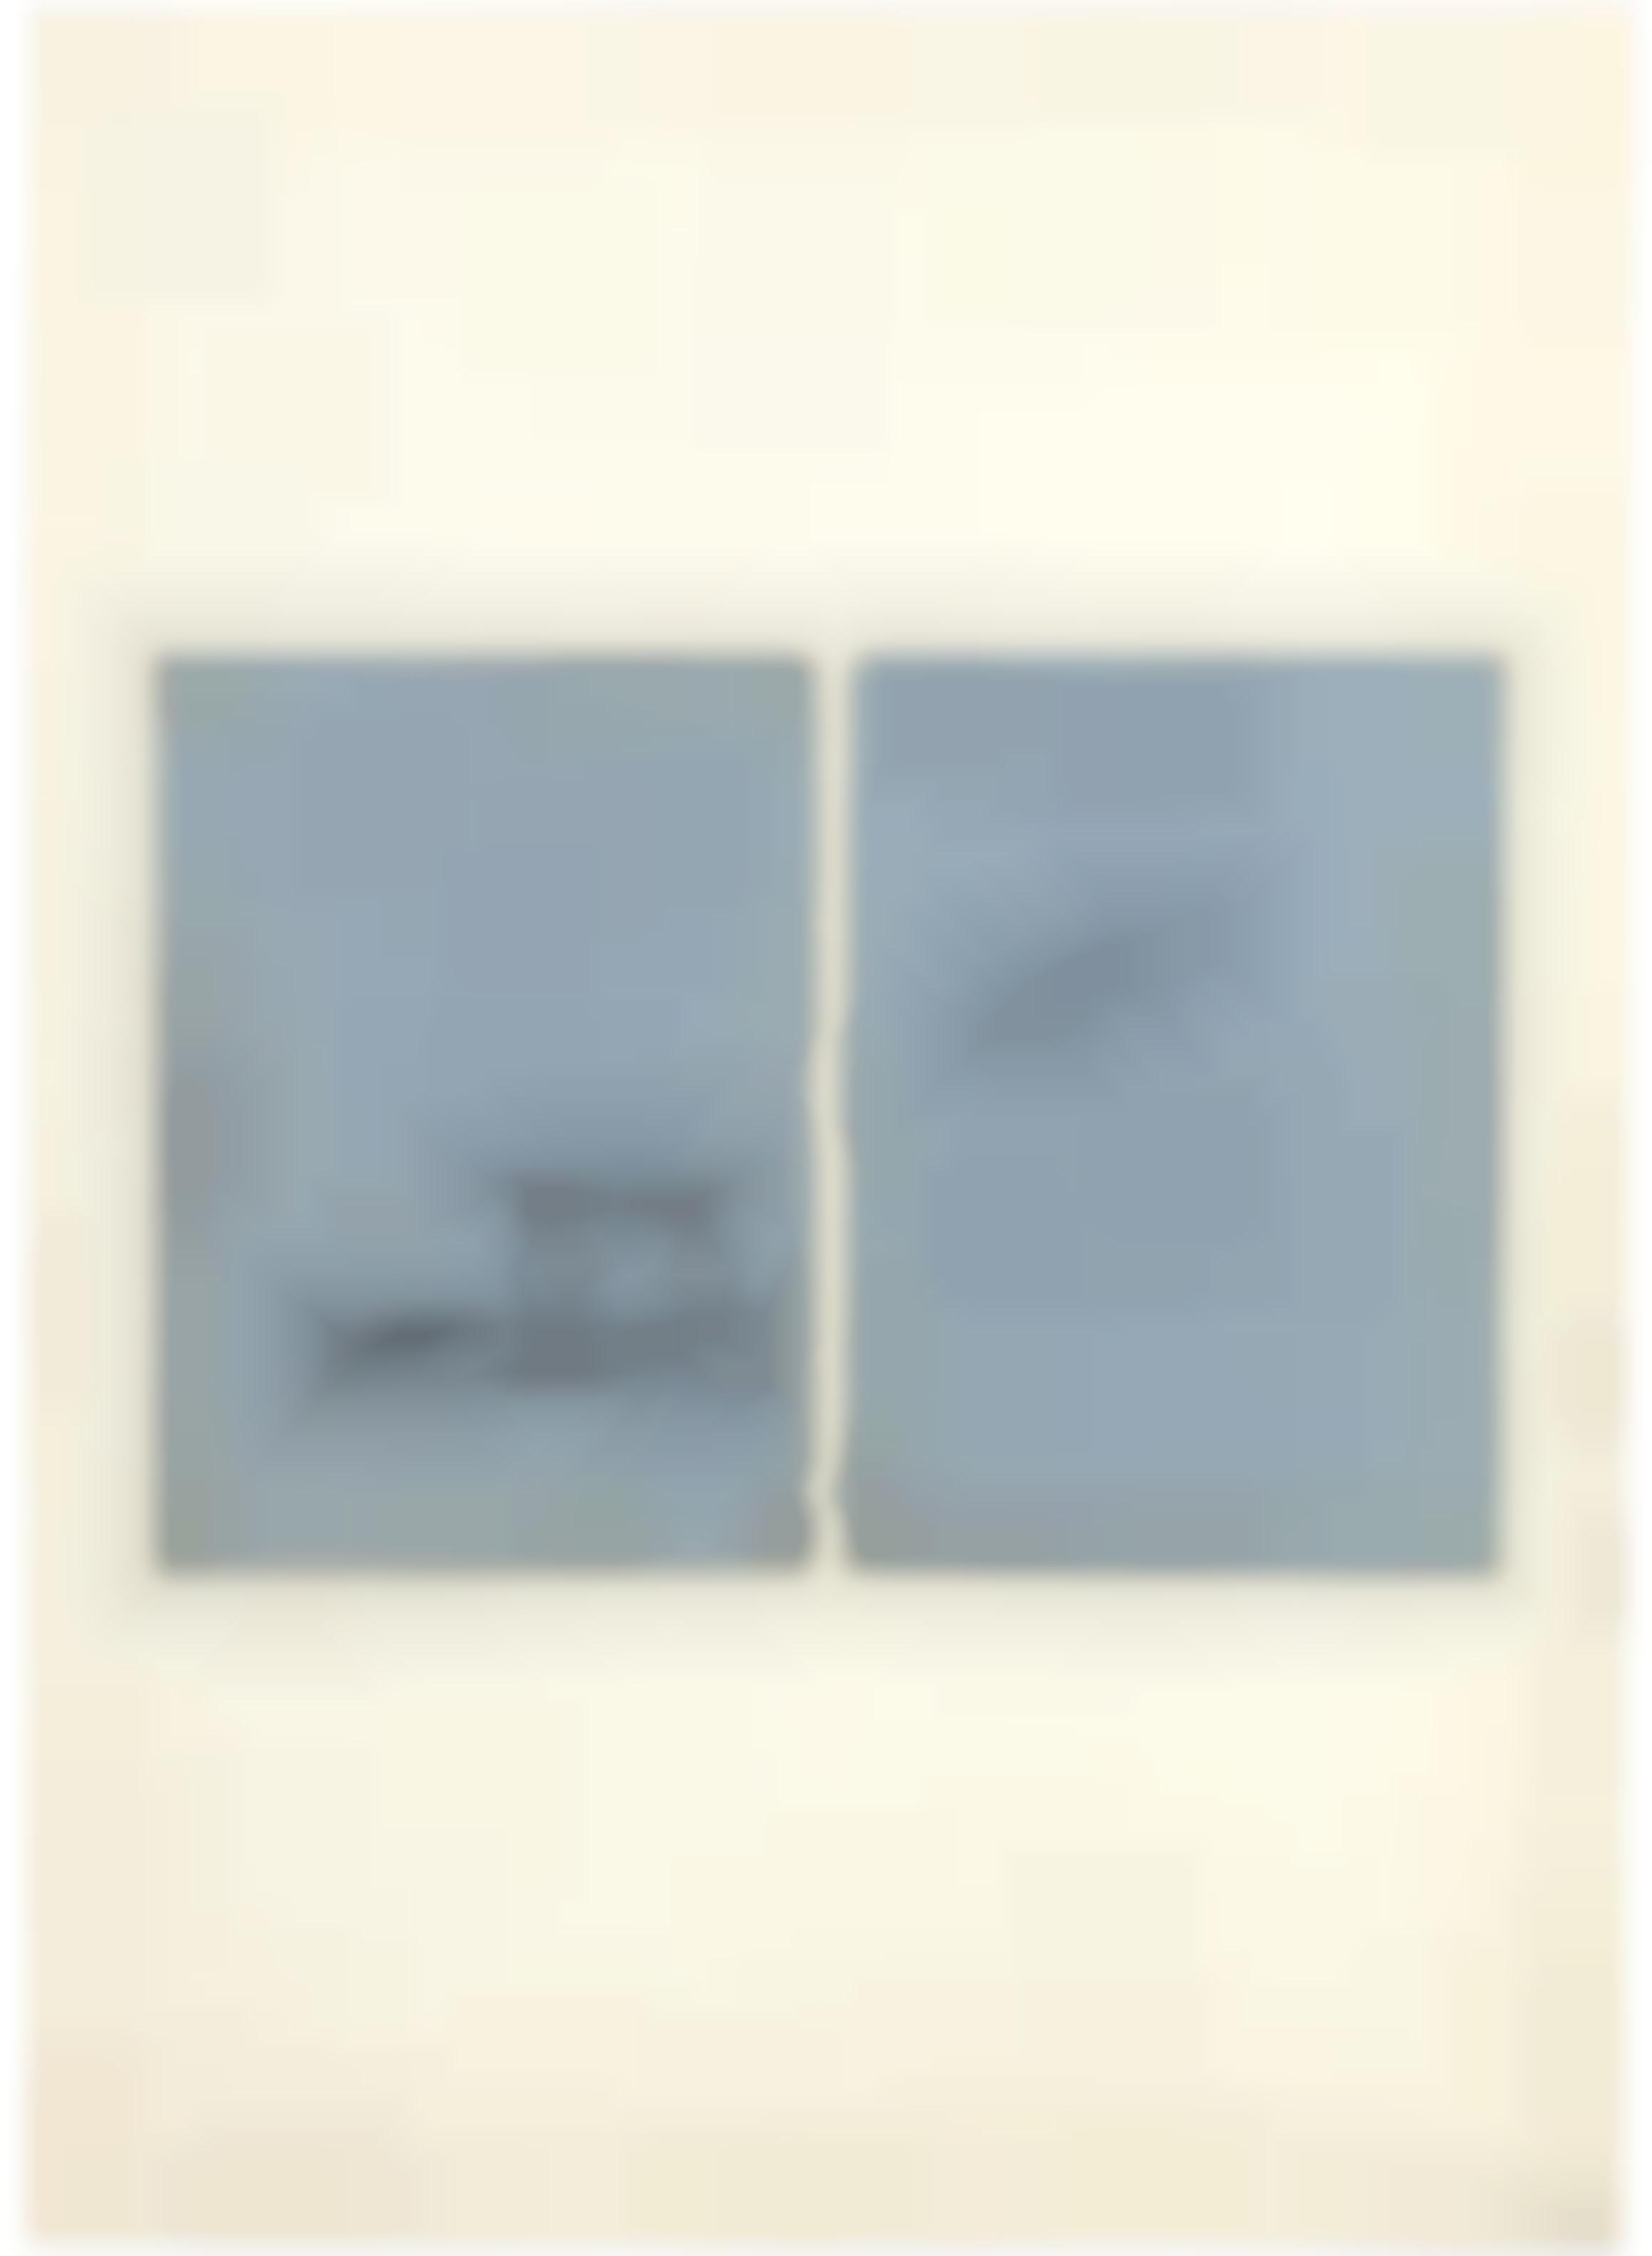 Joseph Beuys-Untitled-1970